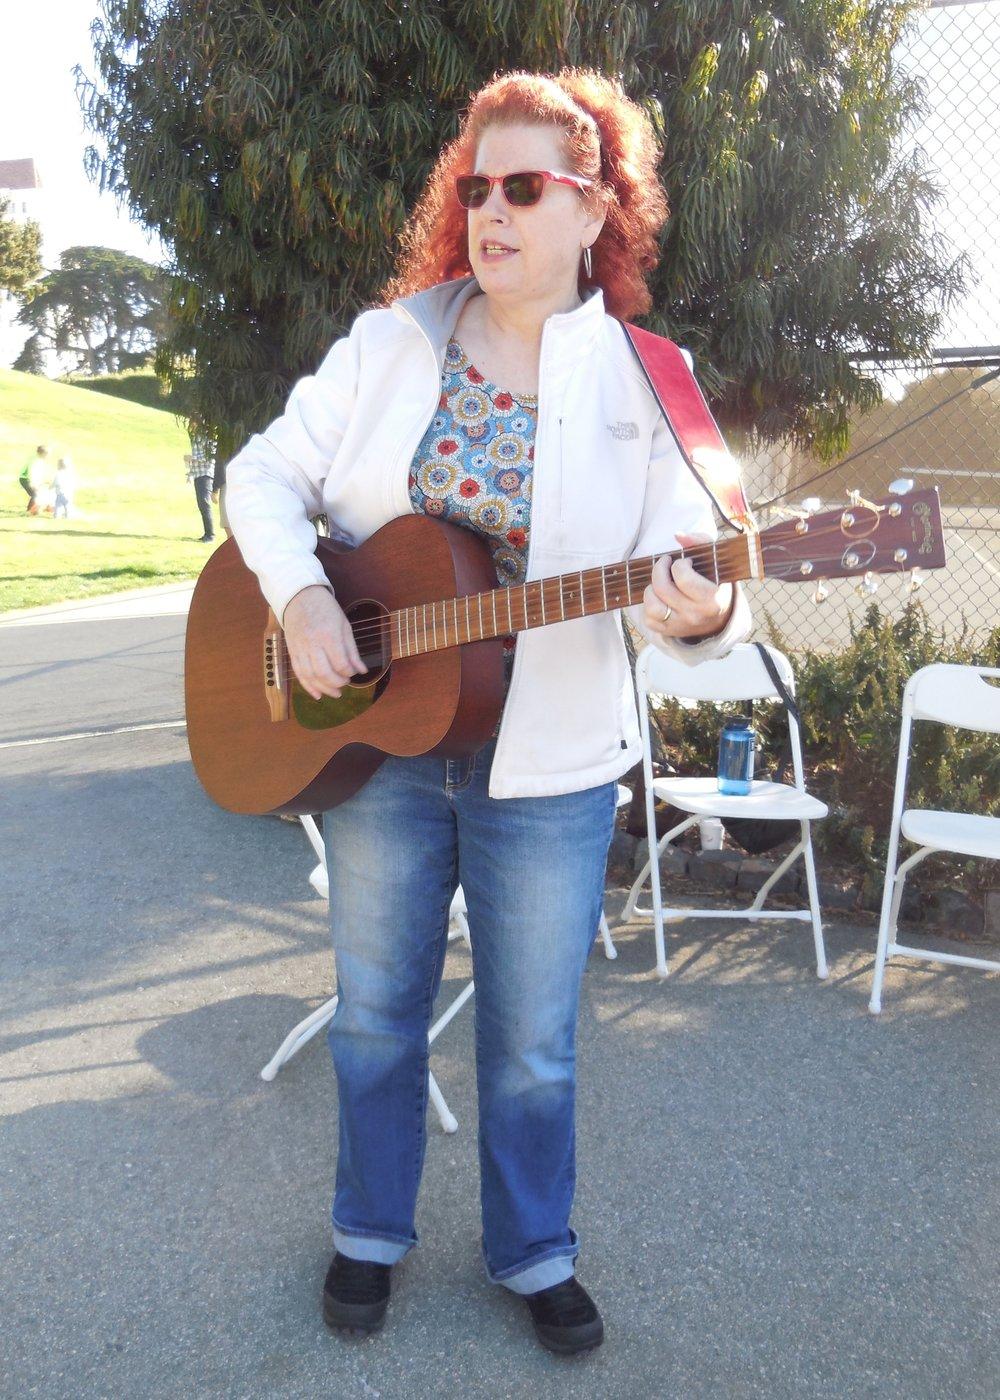 Anna Karney, musician